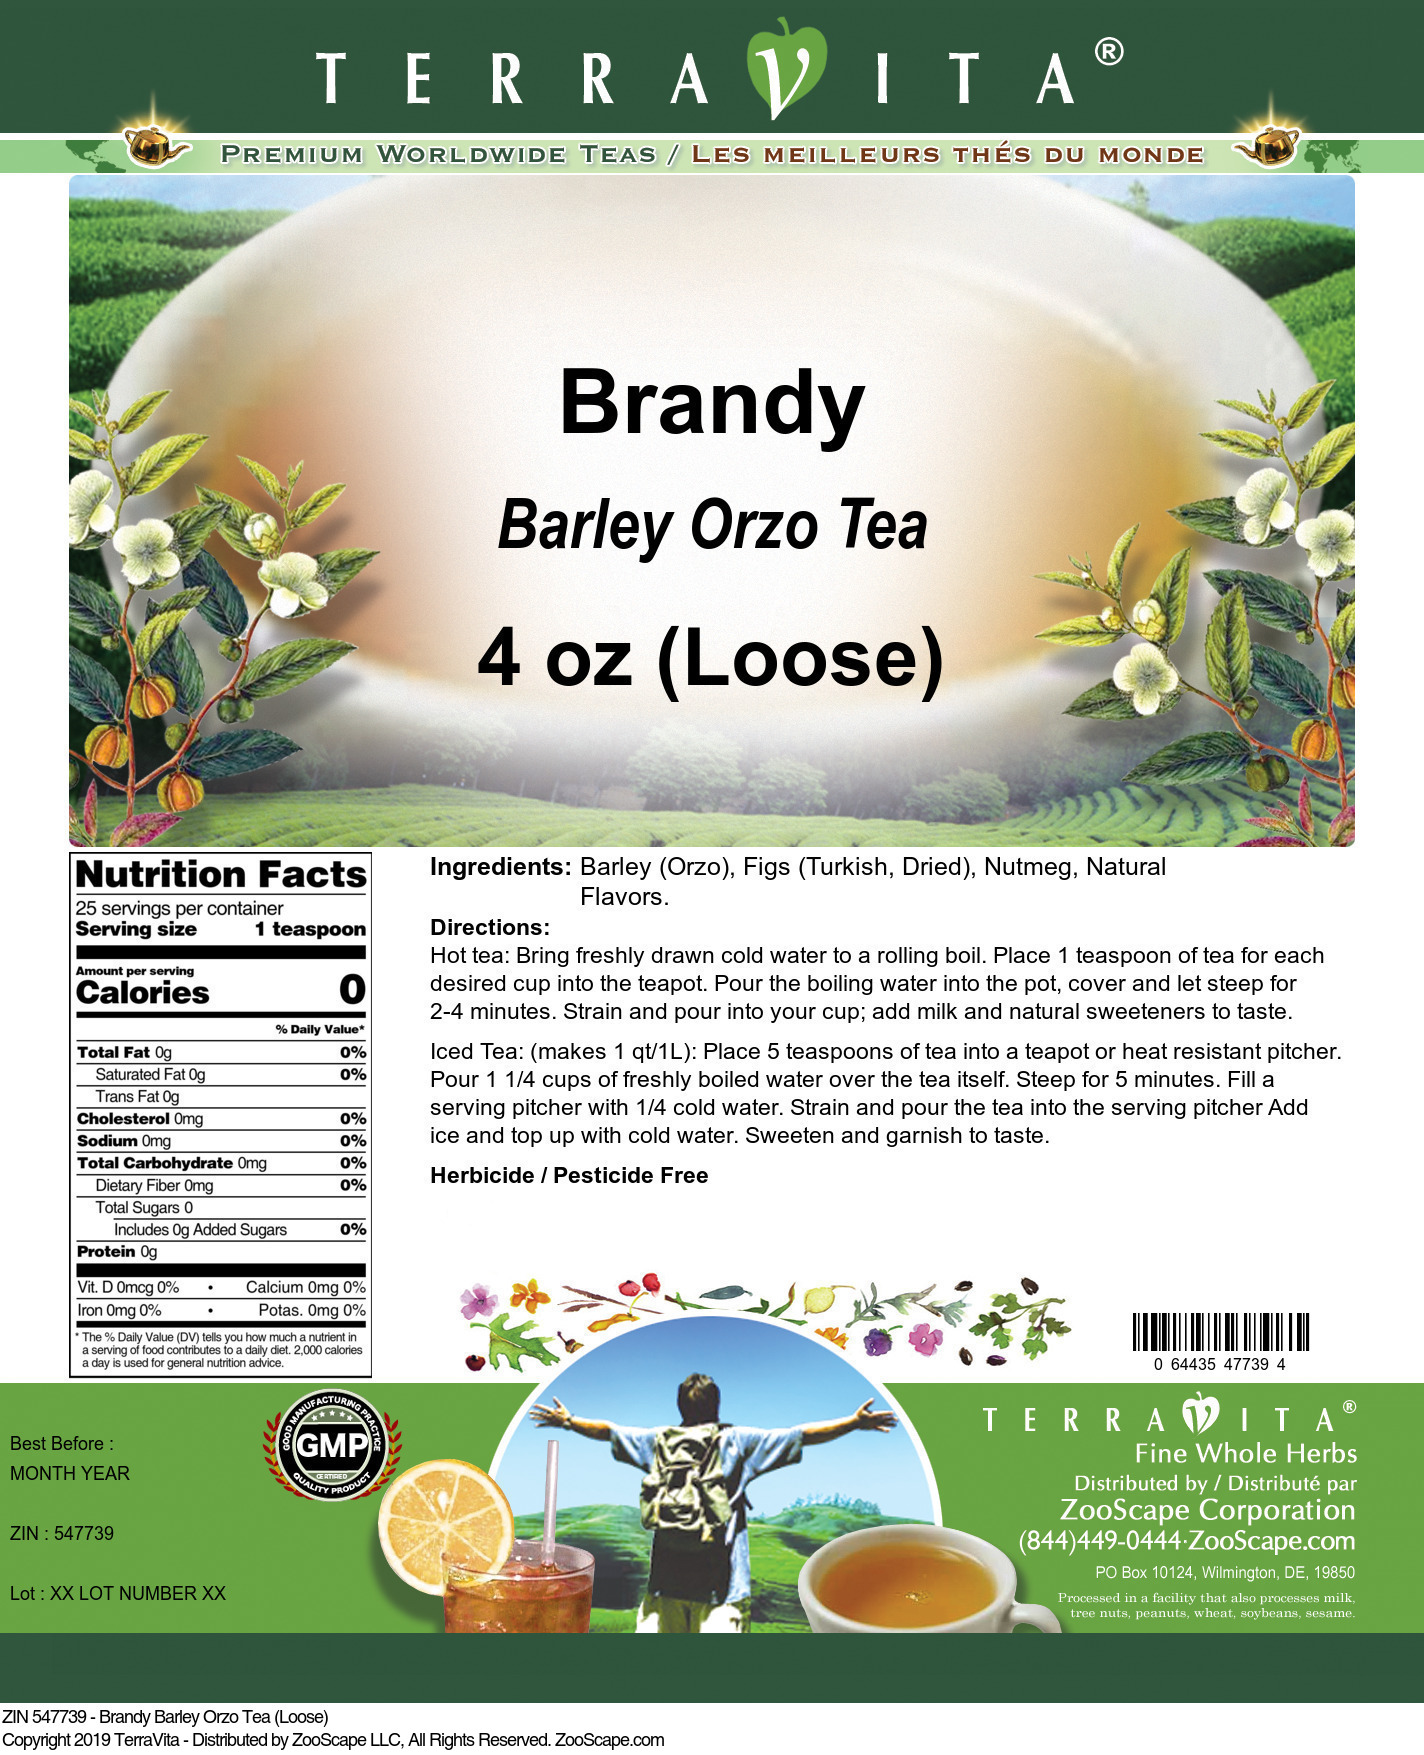 Brandy Barley Orzo Tea (Loose)